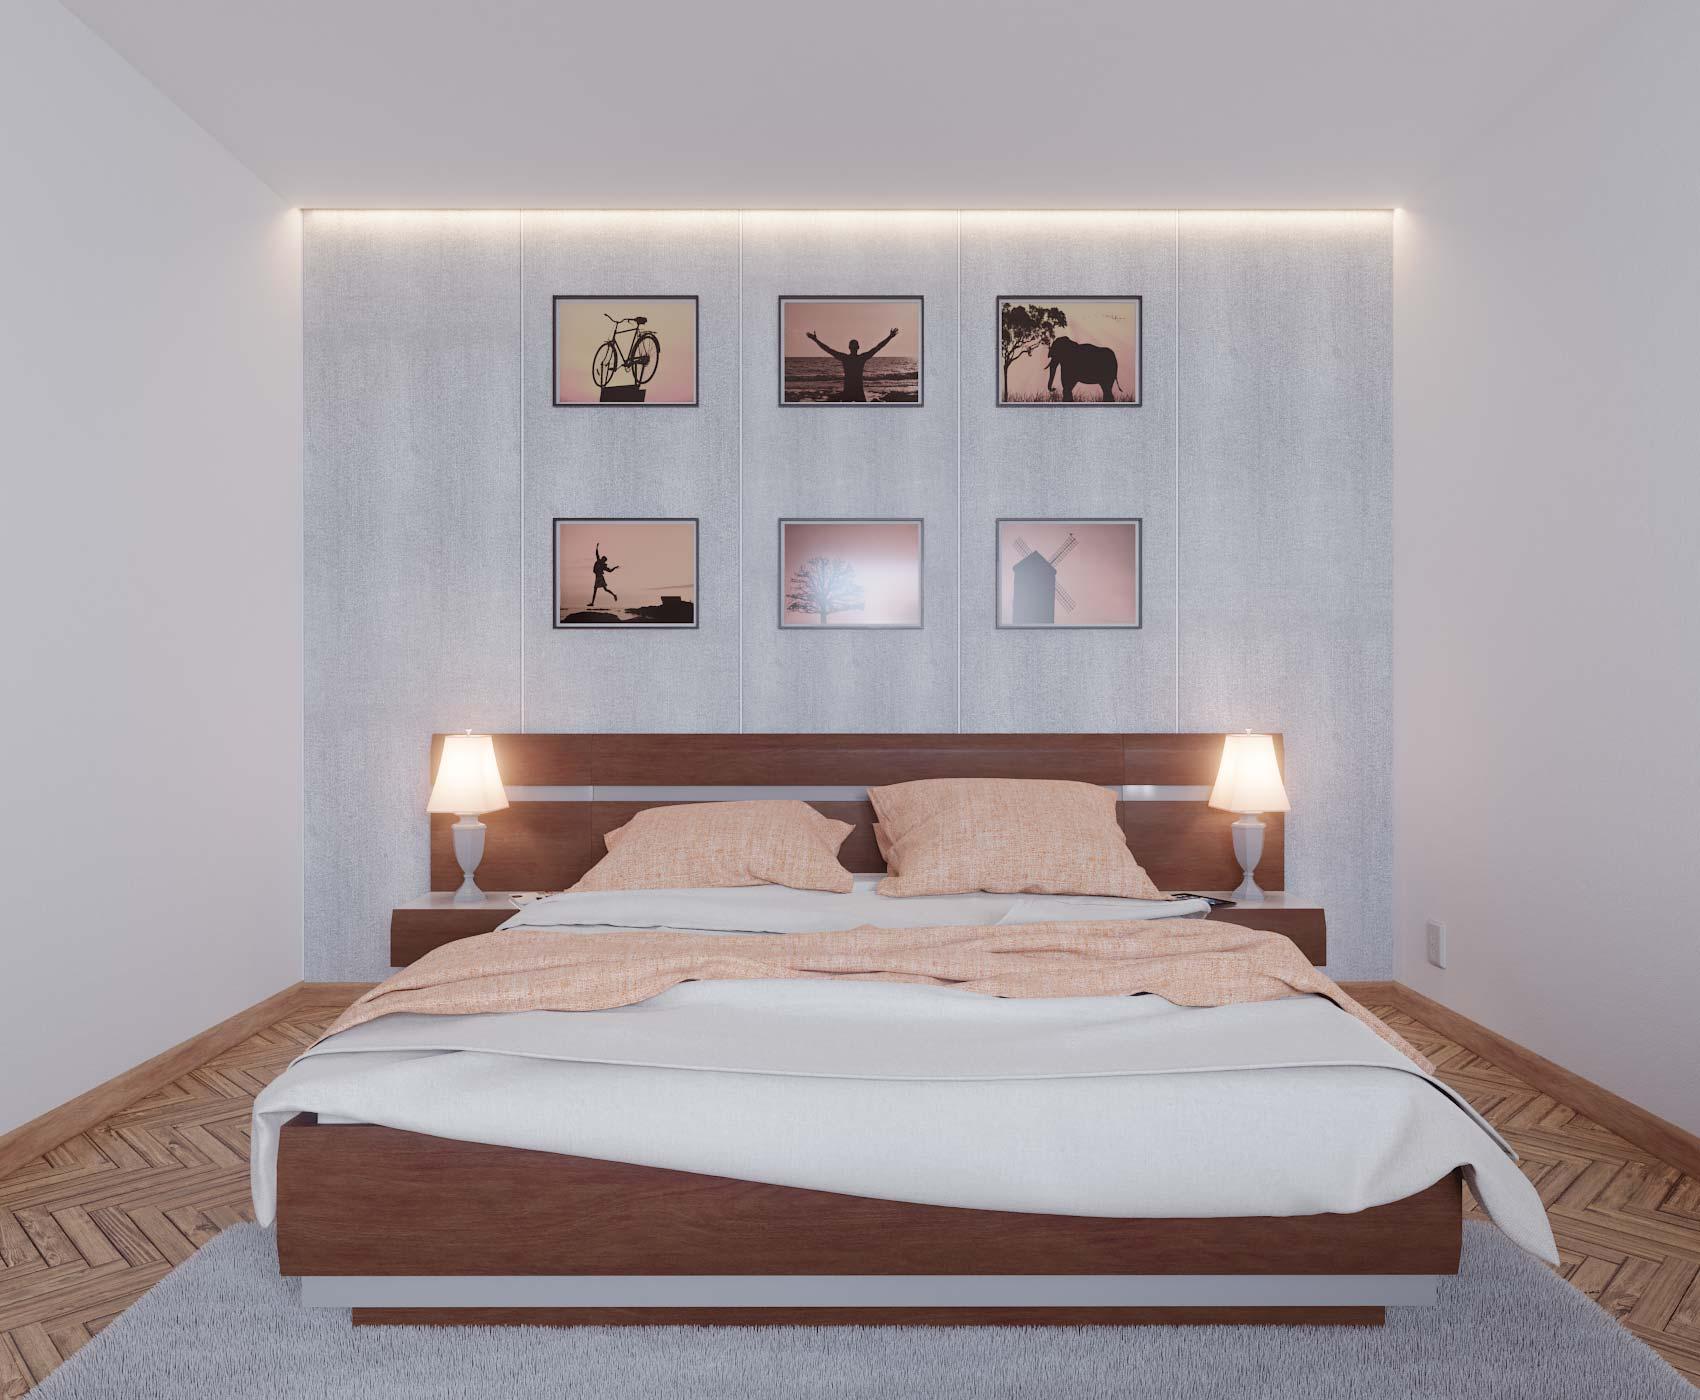 idea3d - vizualizácia spálňa 2